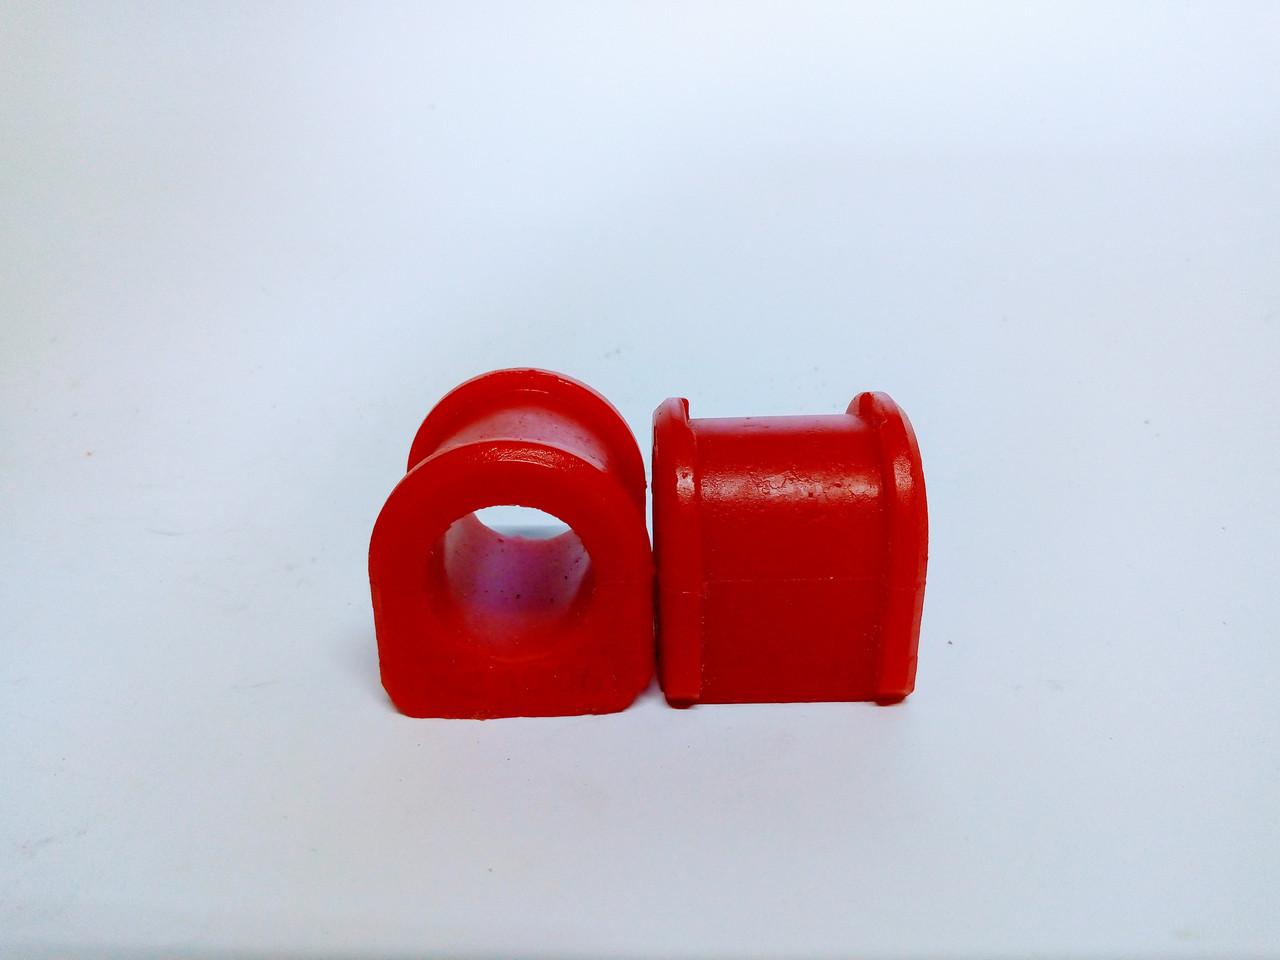 Полиуретановые втулки стабилизатора OpelVivaro (E7), Vivaro  (F7),VECTRA-B,Astra F Classic втулка стабилизатор